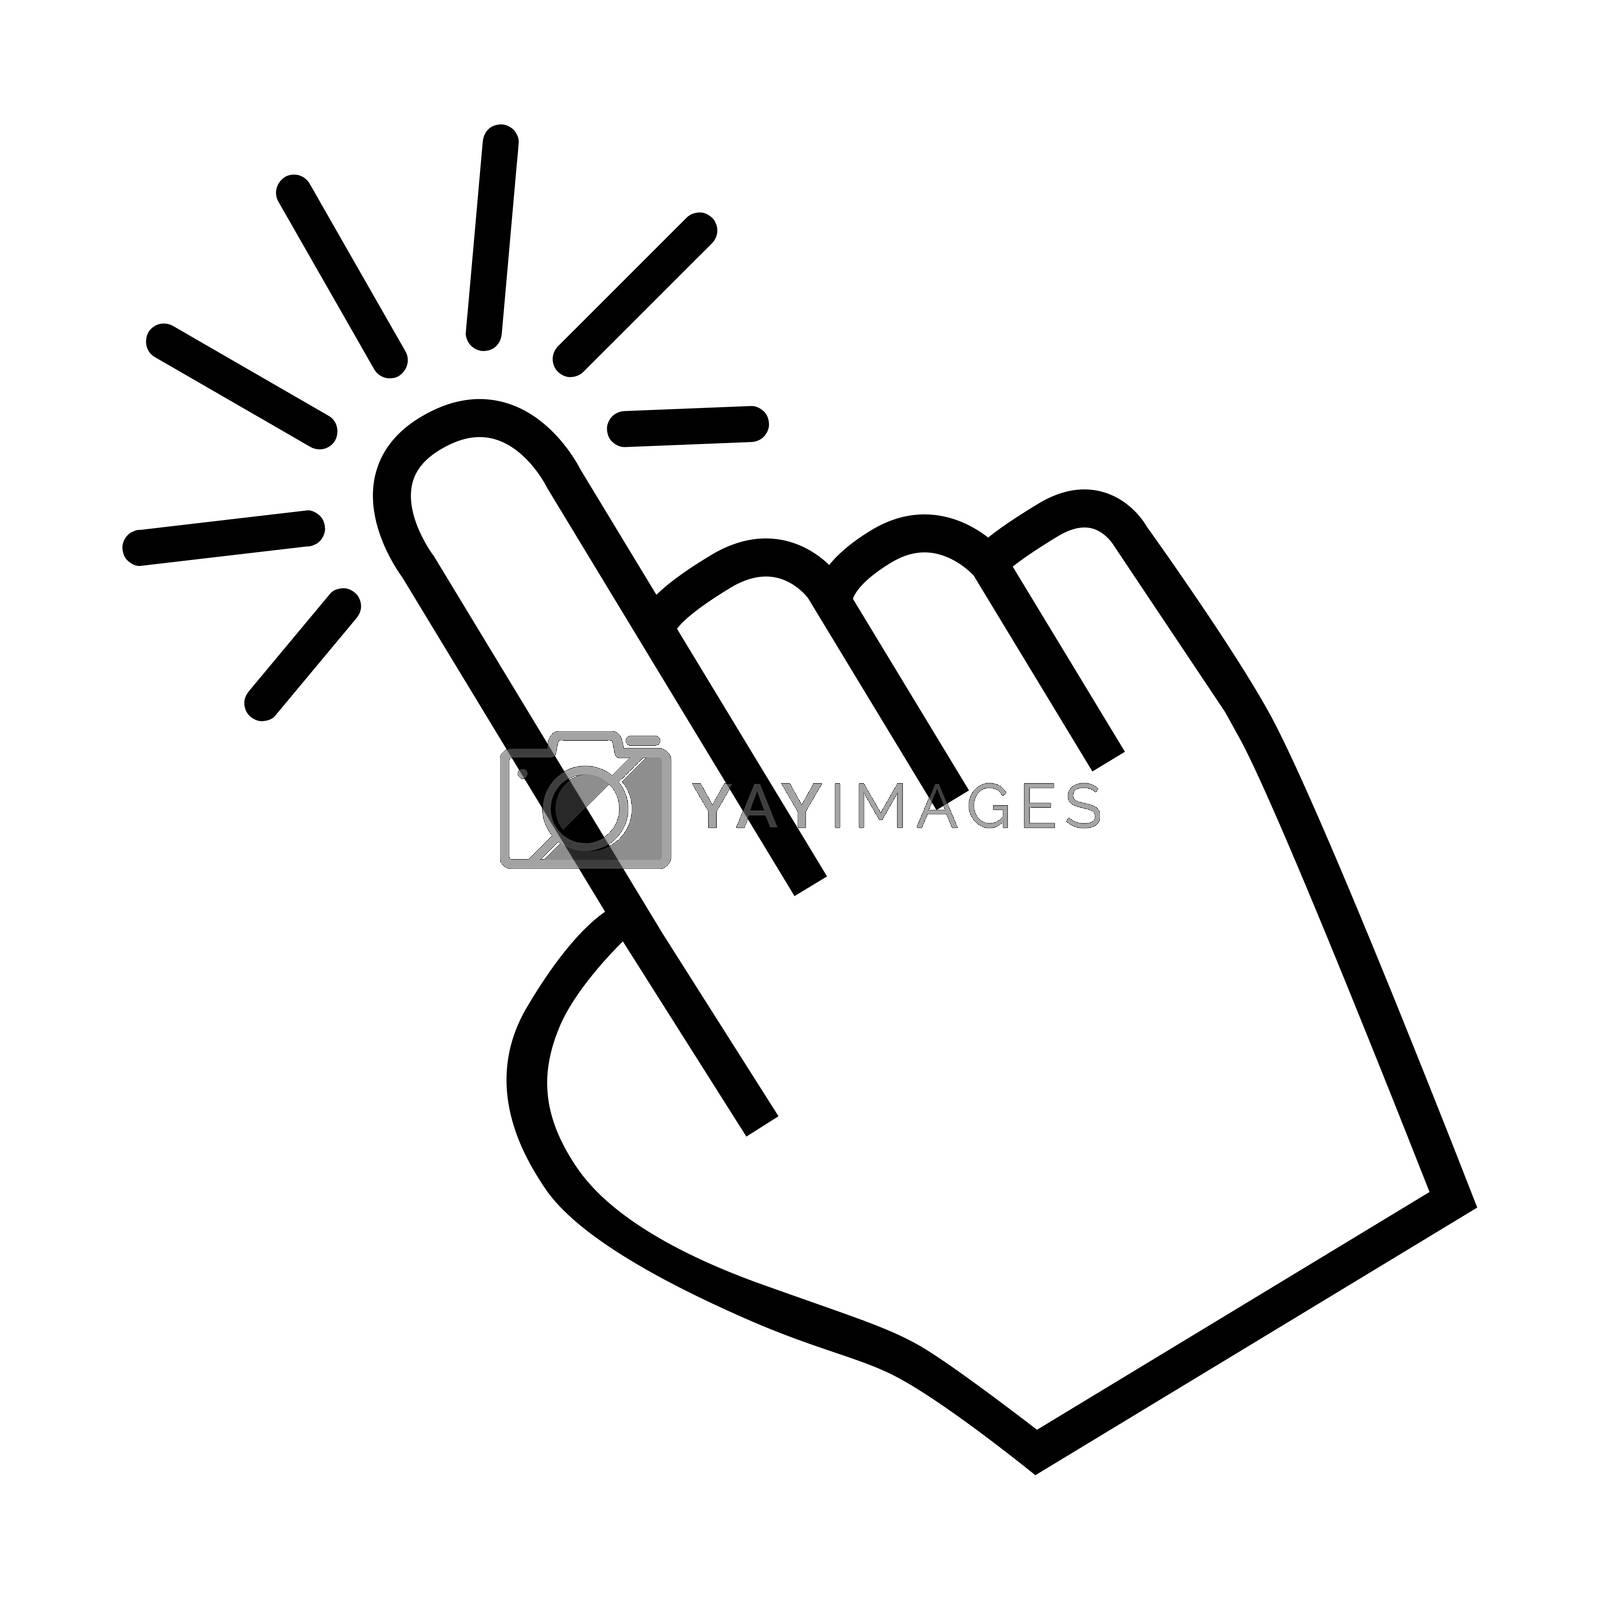 Royalty free image of cursor hand icon by mizar_21984